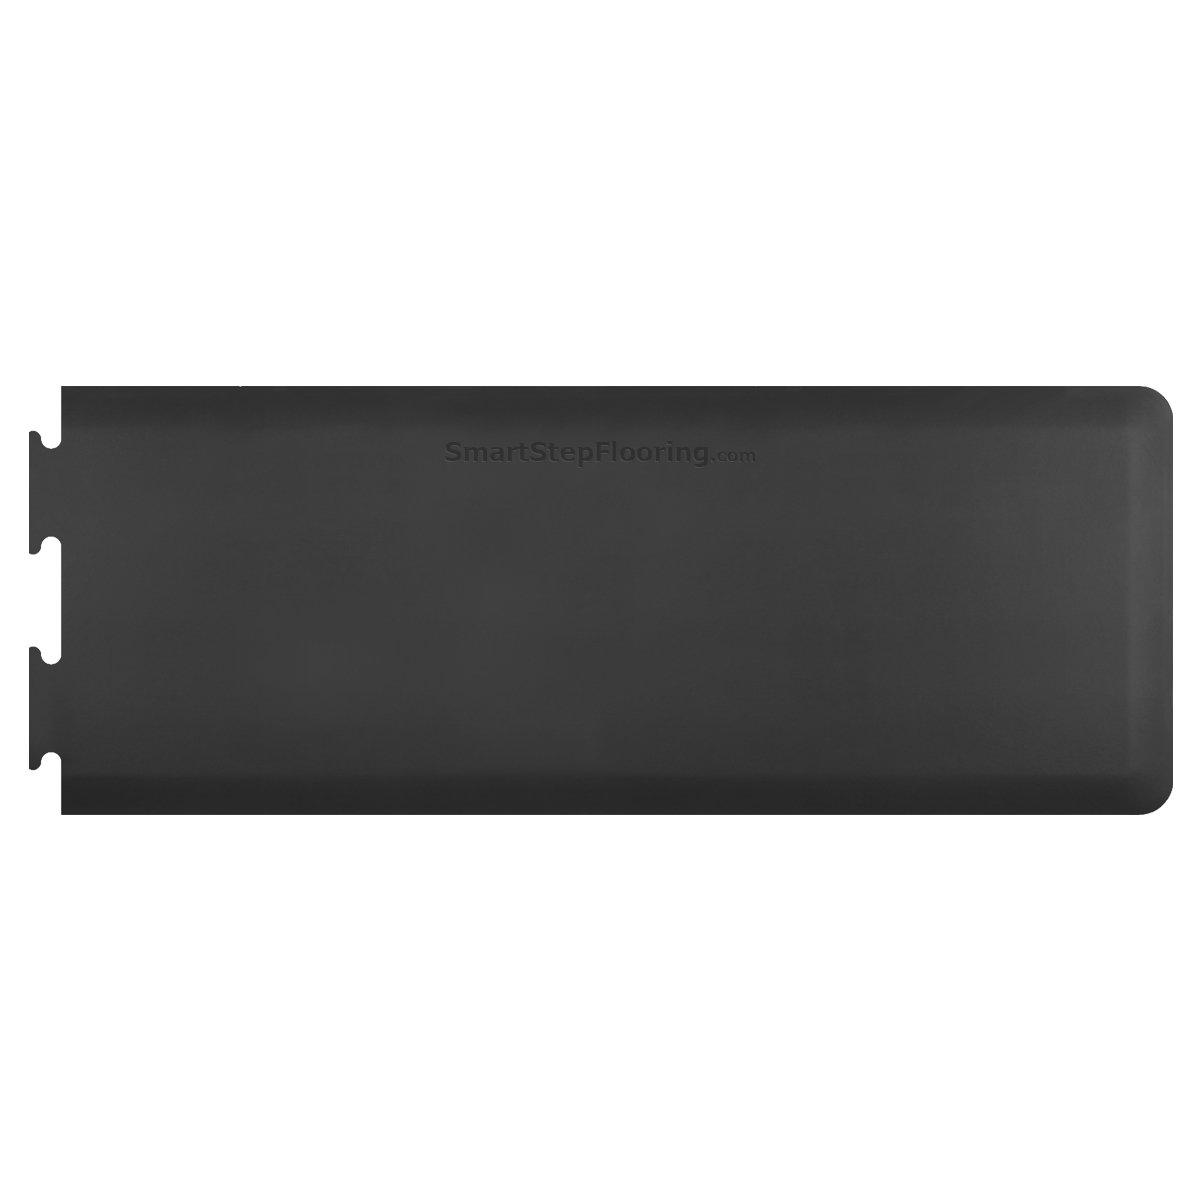 Smart Step Maxum Anti-Fatigue Polyurethane Mat, Right Puzzle Runner Segment, 33'' Length x 24'' Width x 5/8'' Thick, Black